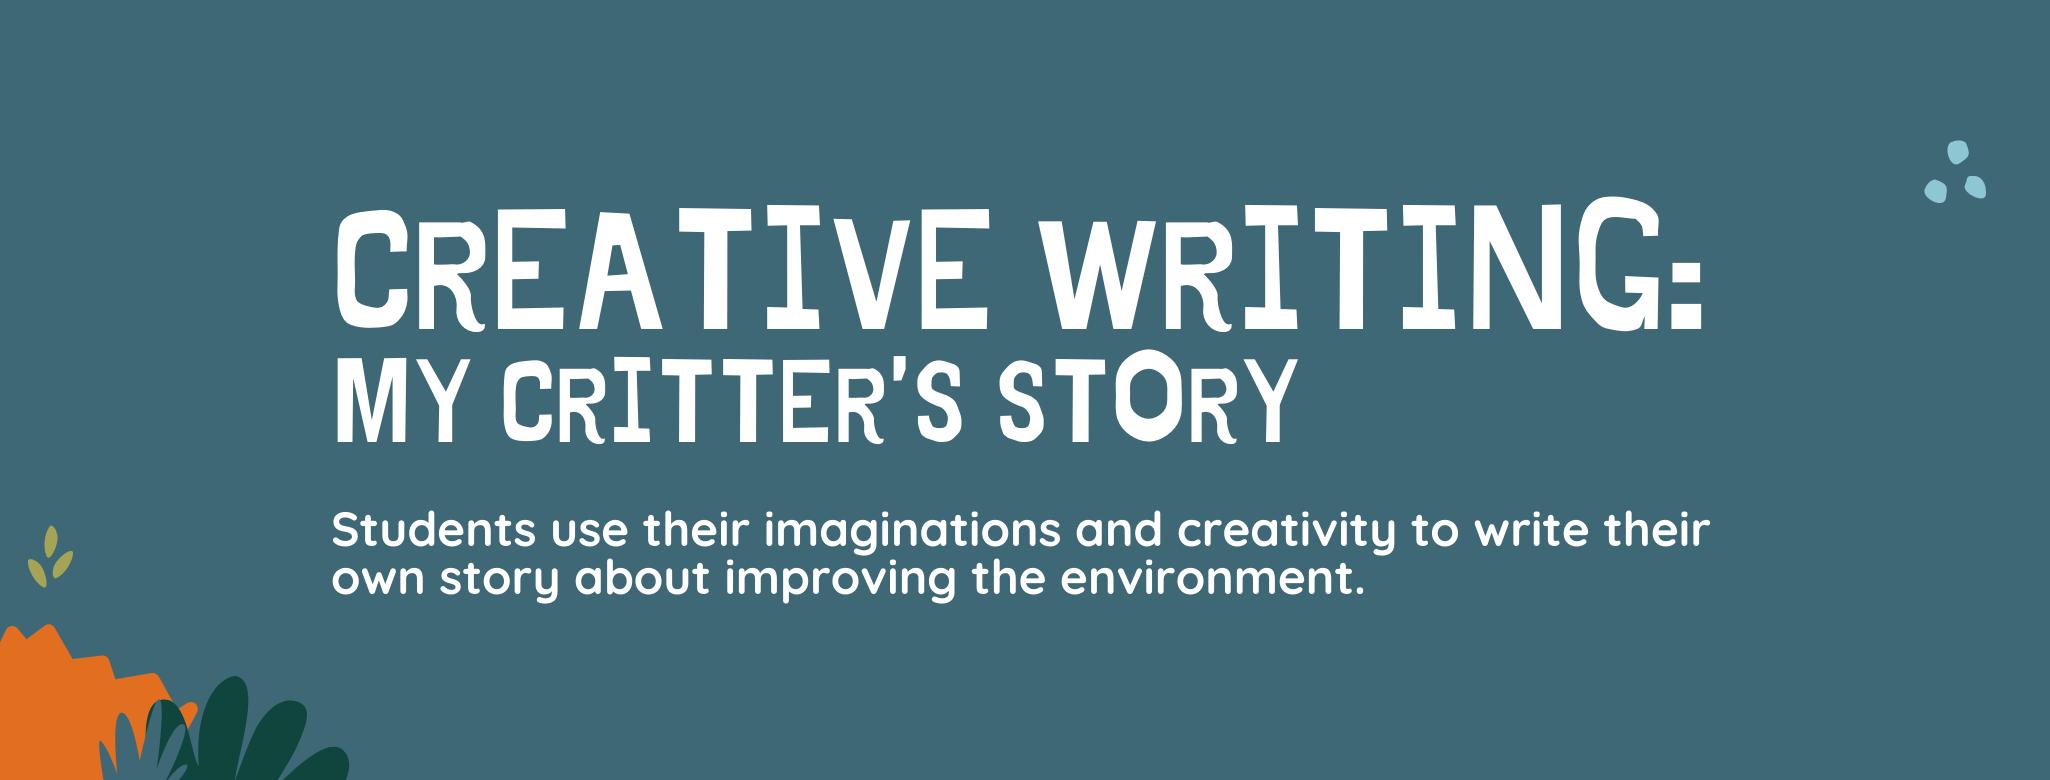 Creative Writing: My Critter's Story